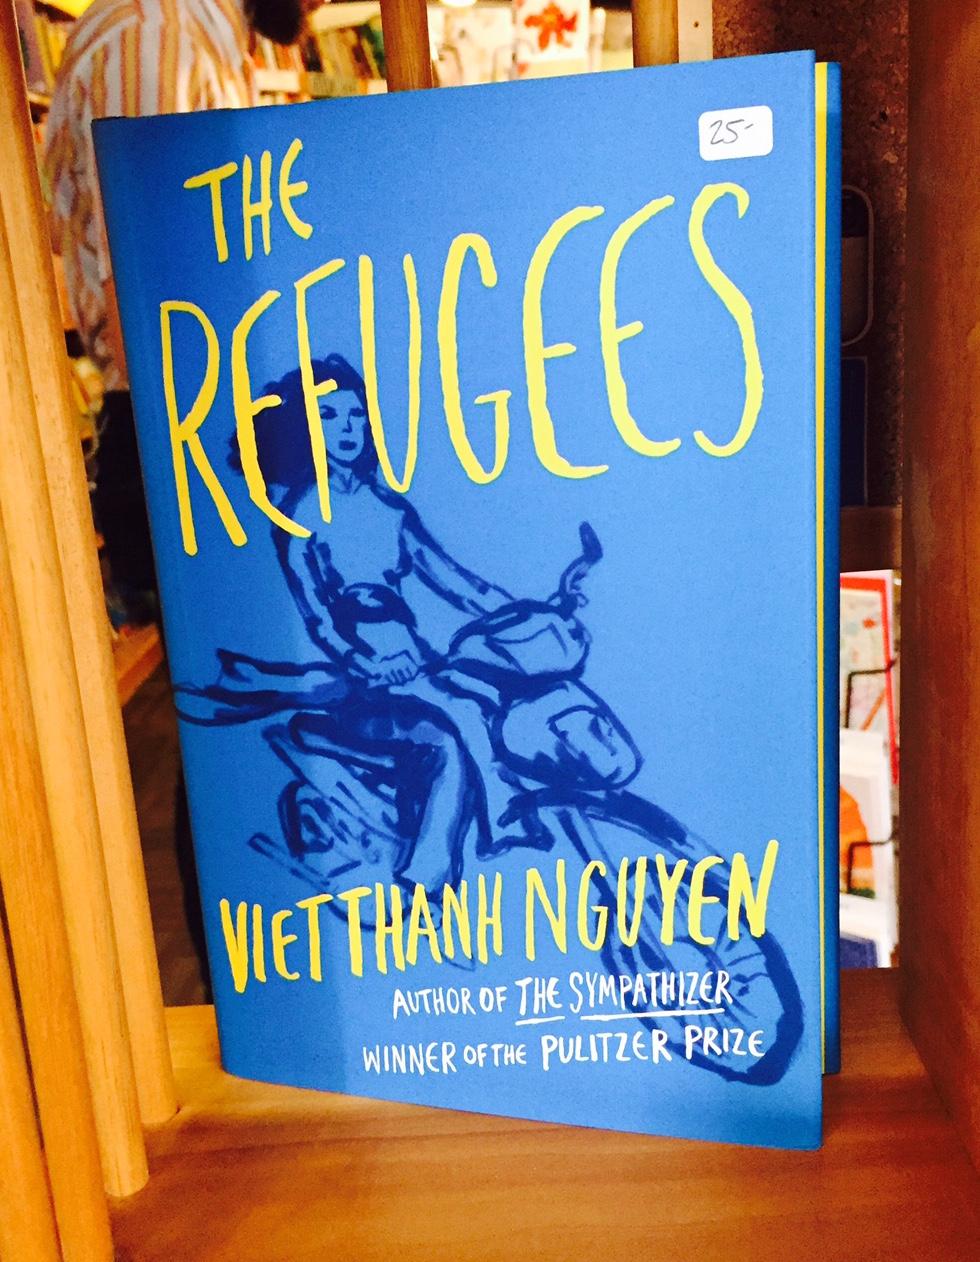 Mac's Backs Viet Thanh Nguyen